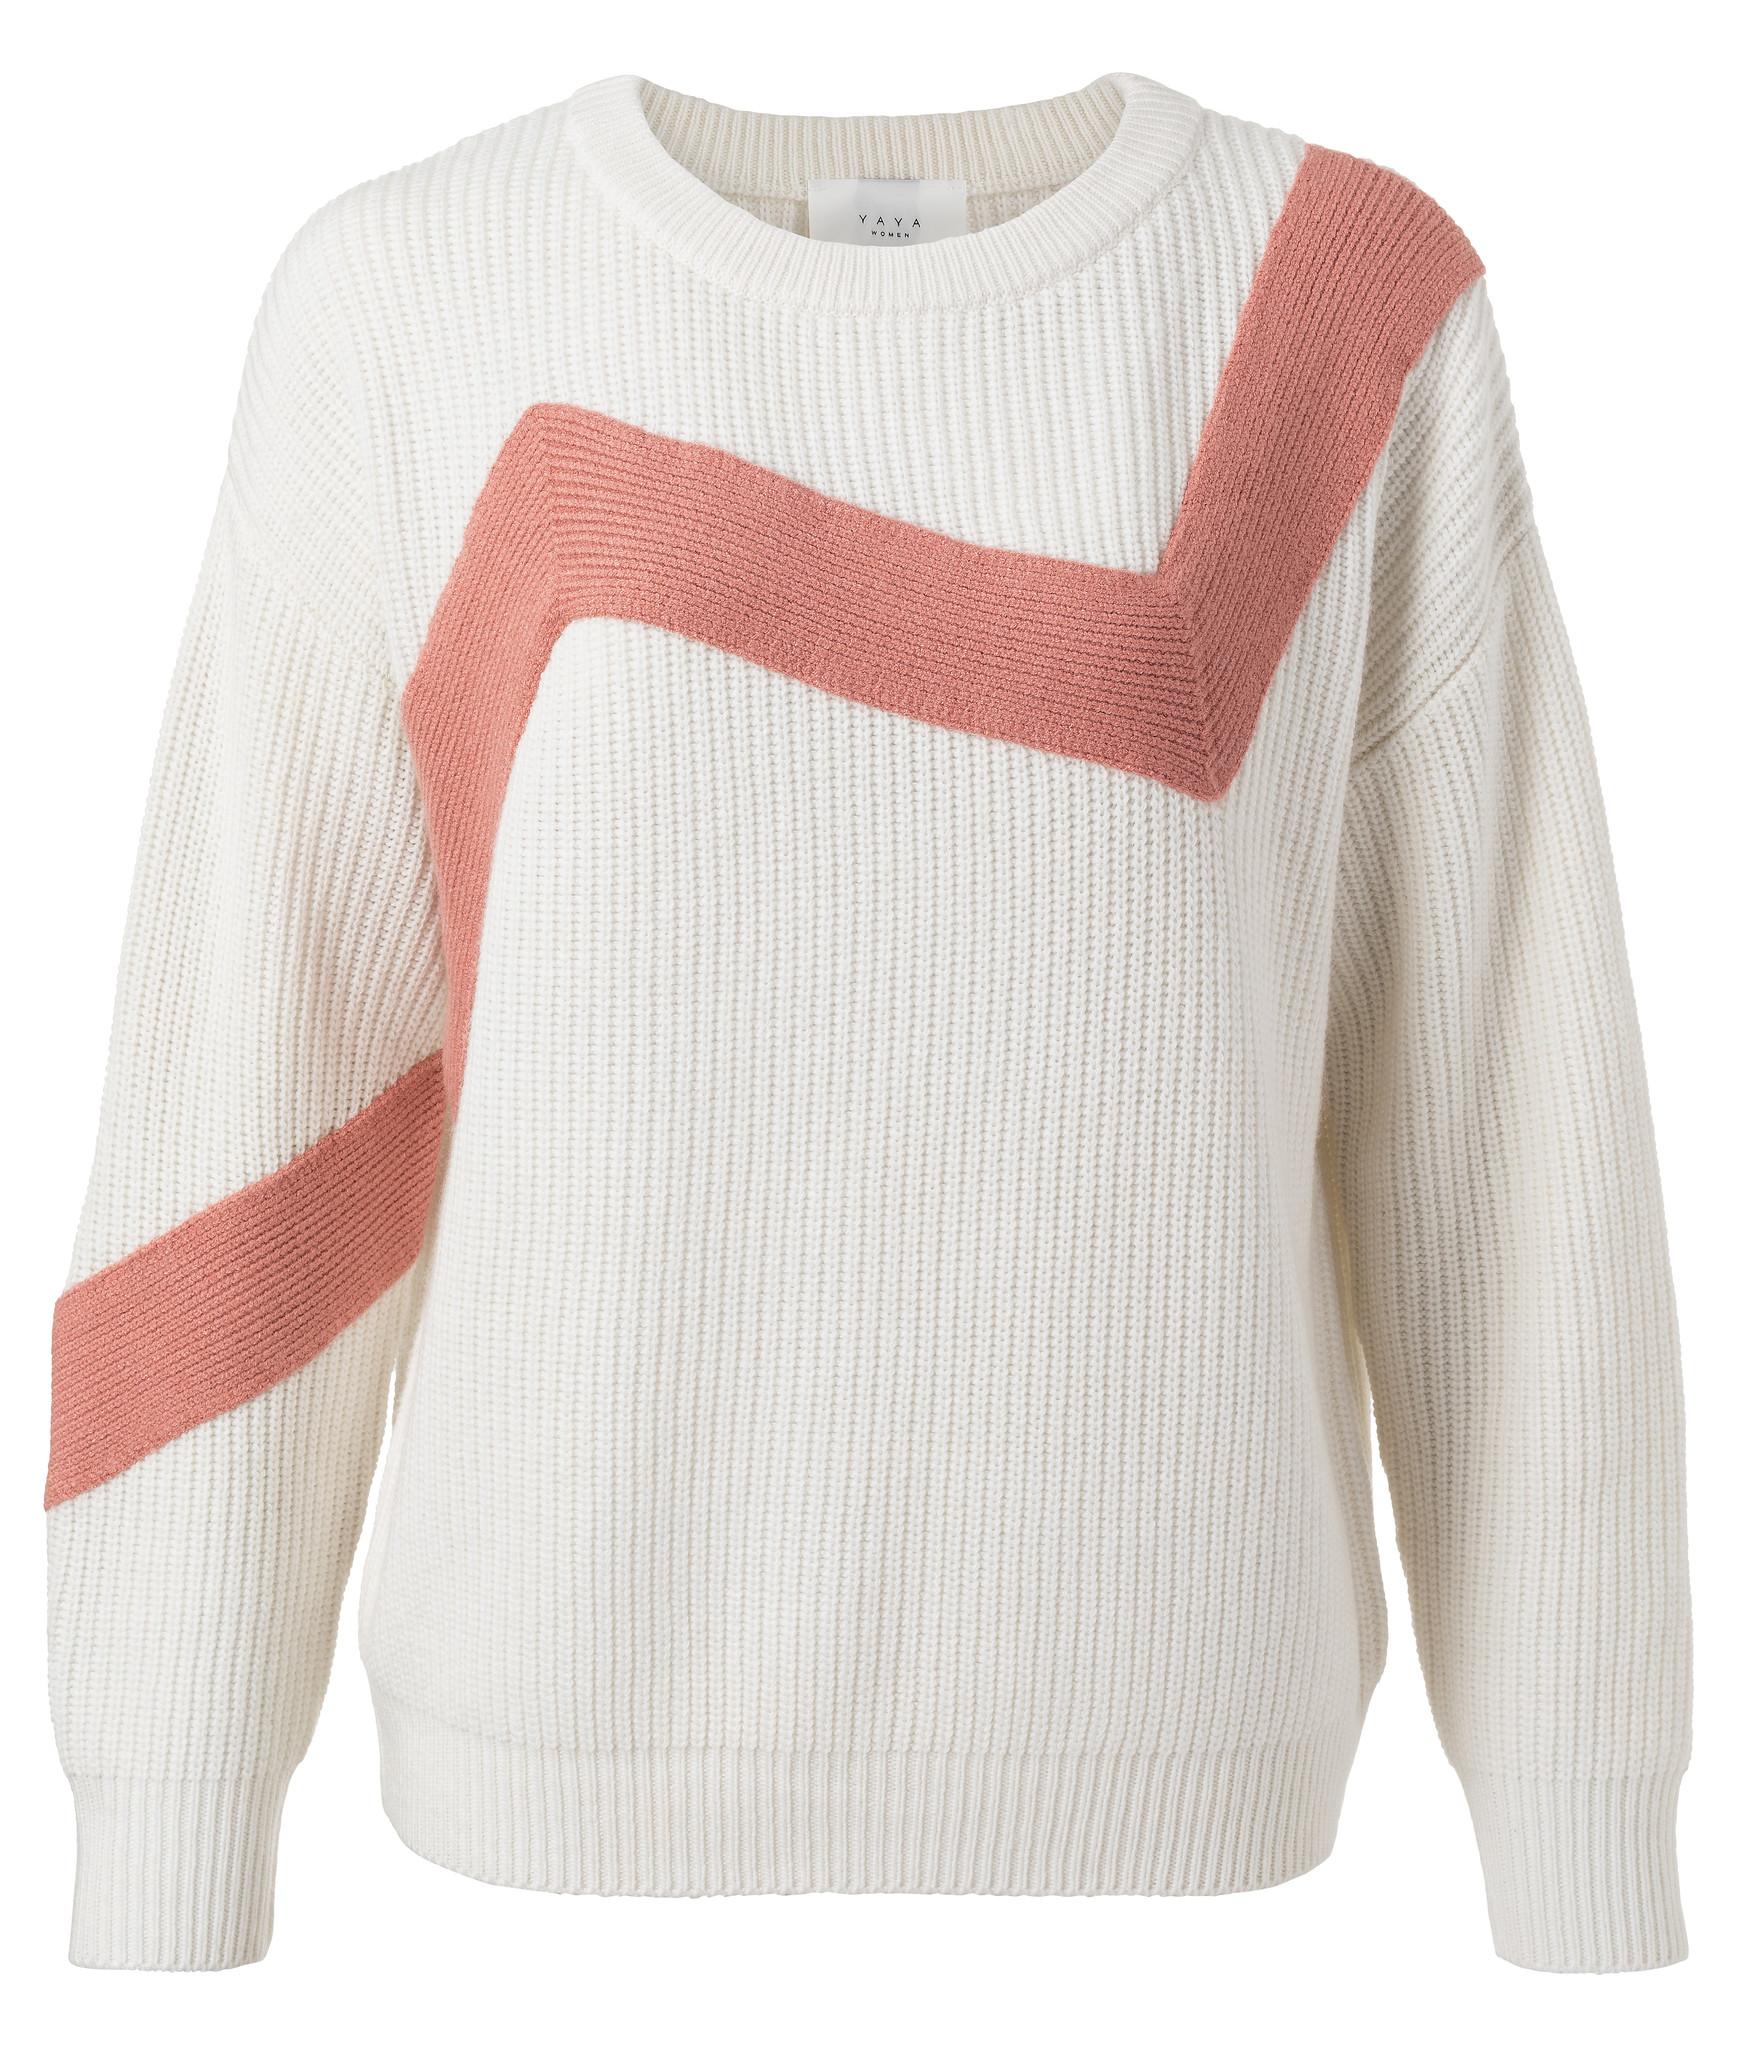 yaya Zig zag sweater 1000389-111-1